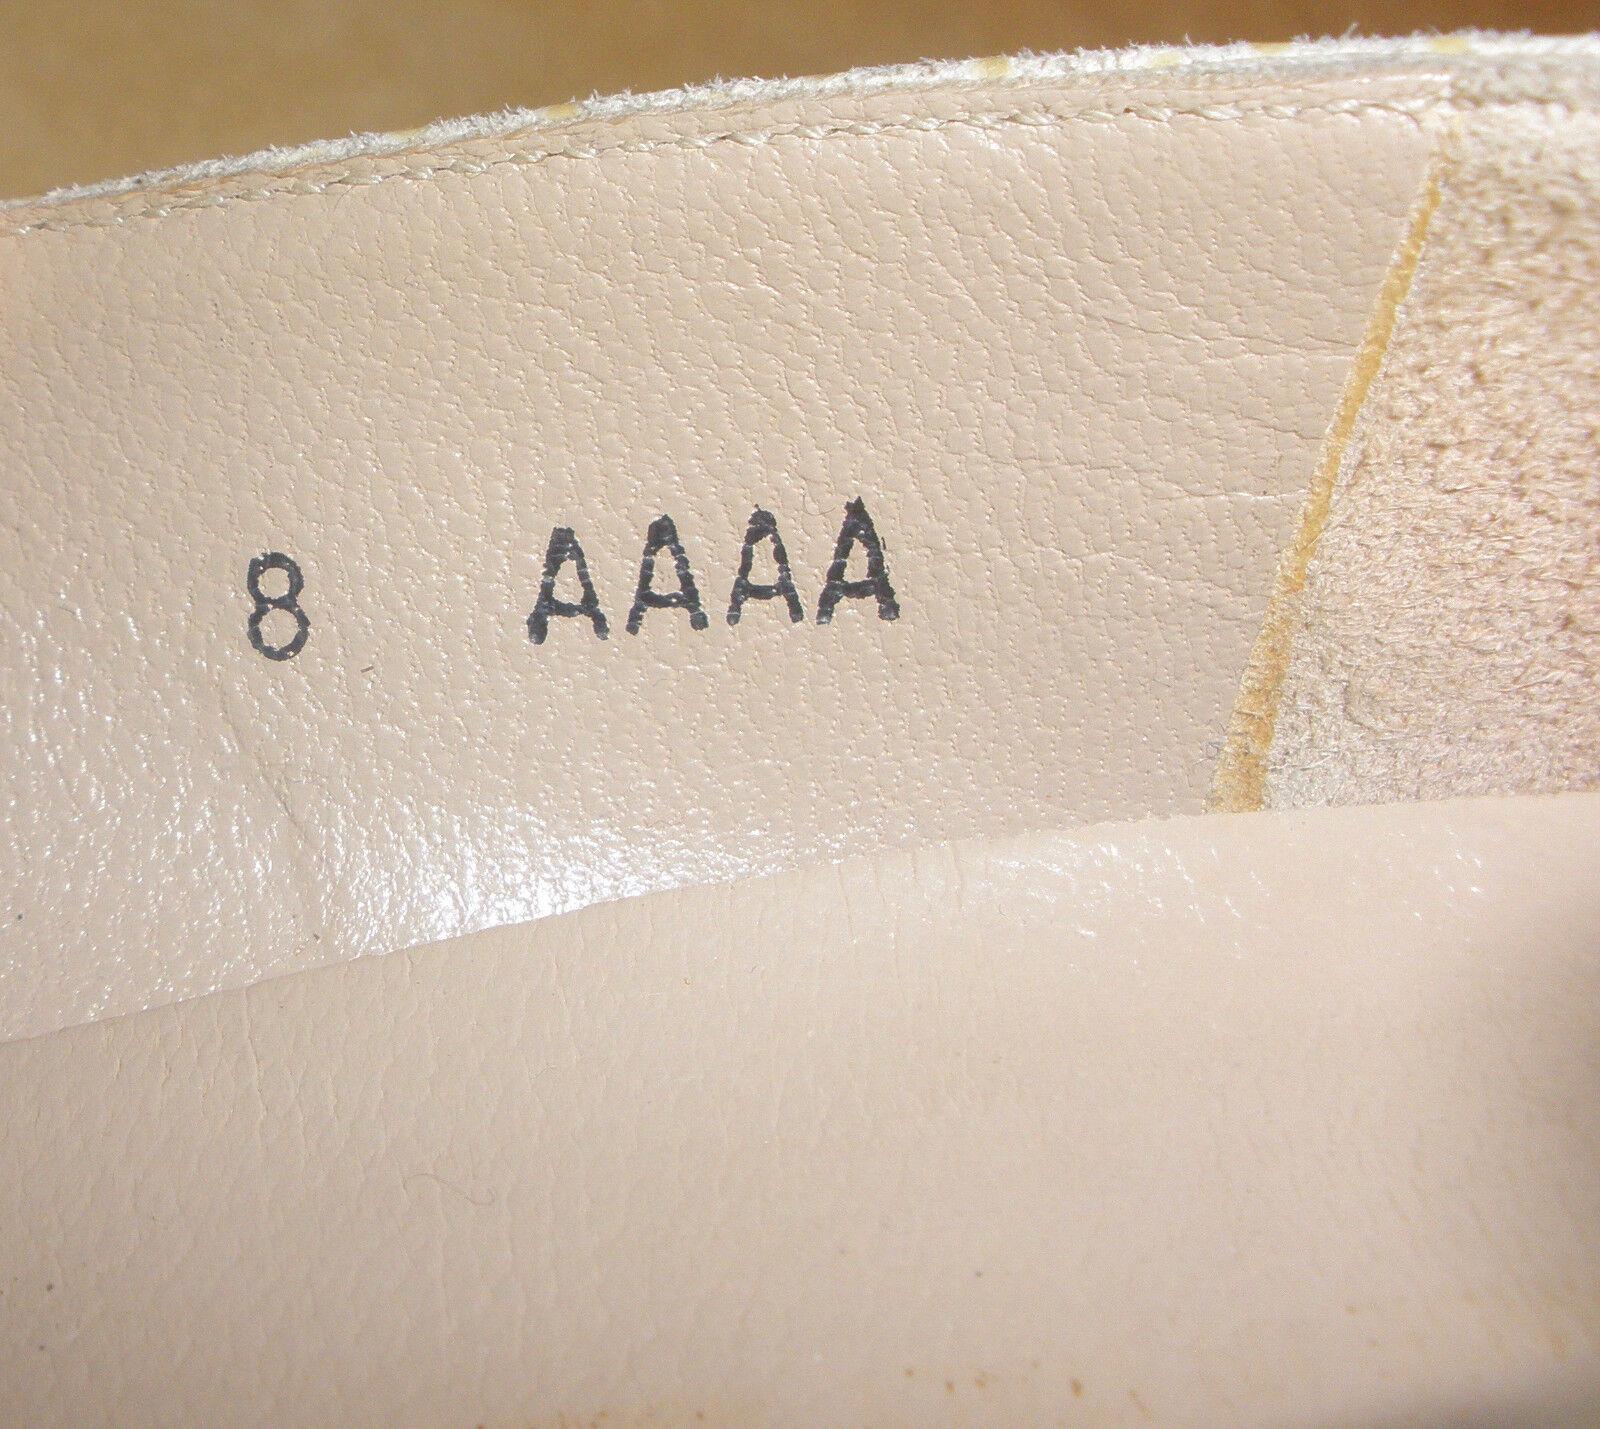 Light Beige Beige Beige Texturot Pump schuhe w  Accent Toes by Salvatore Ferragamo Größe 8AAAA 3ee191